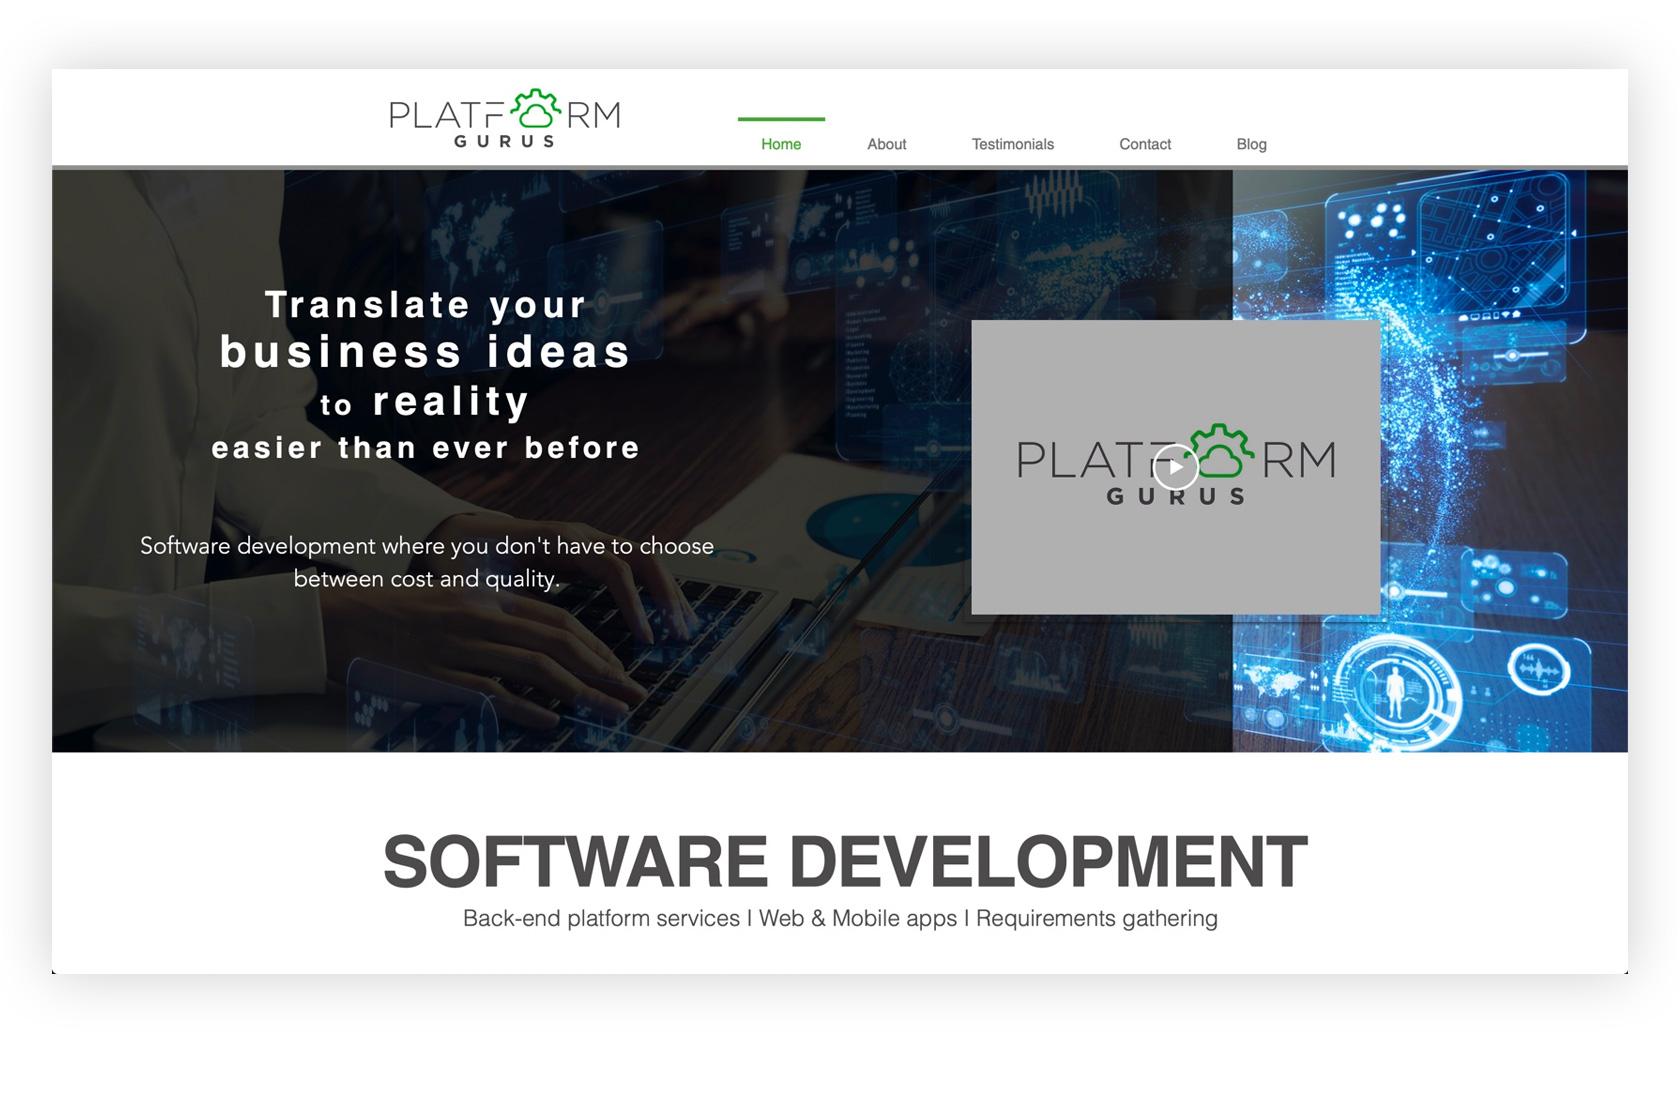 Platform gurus homepage